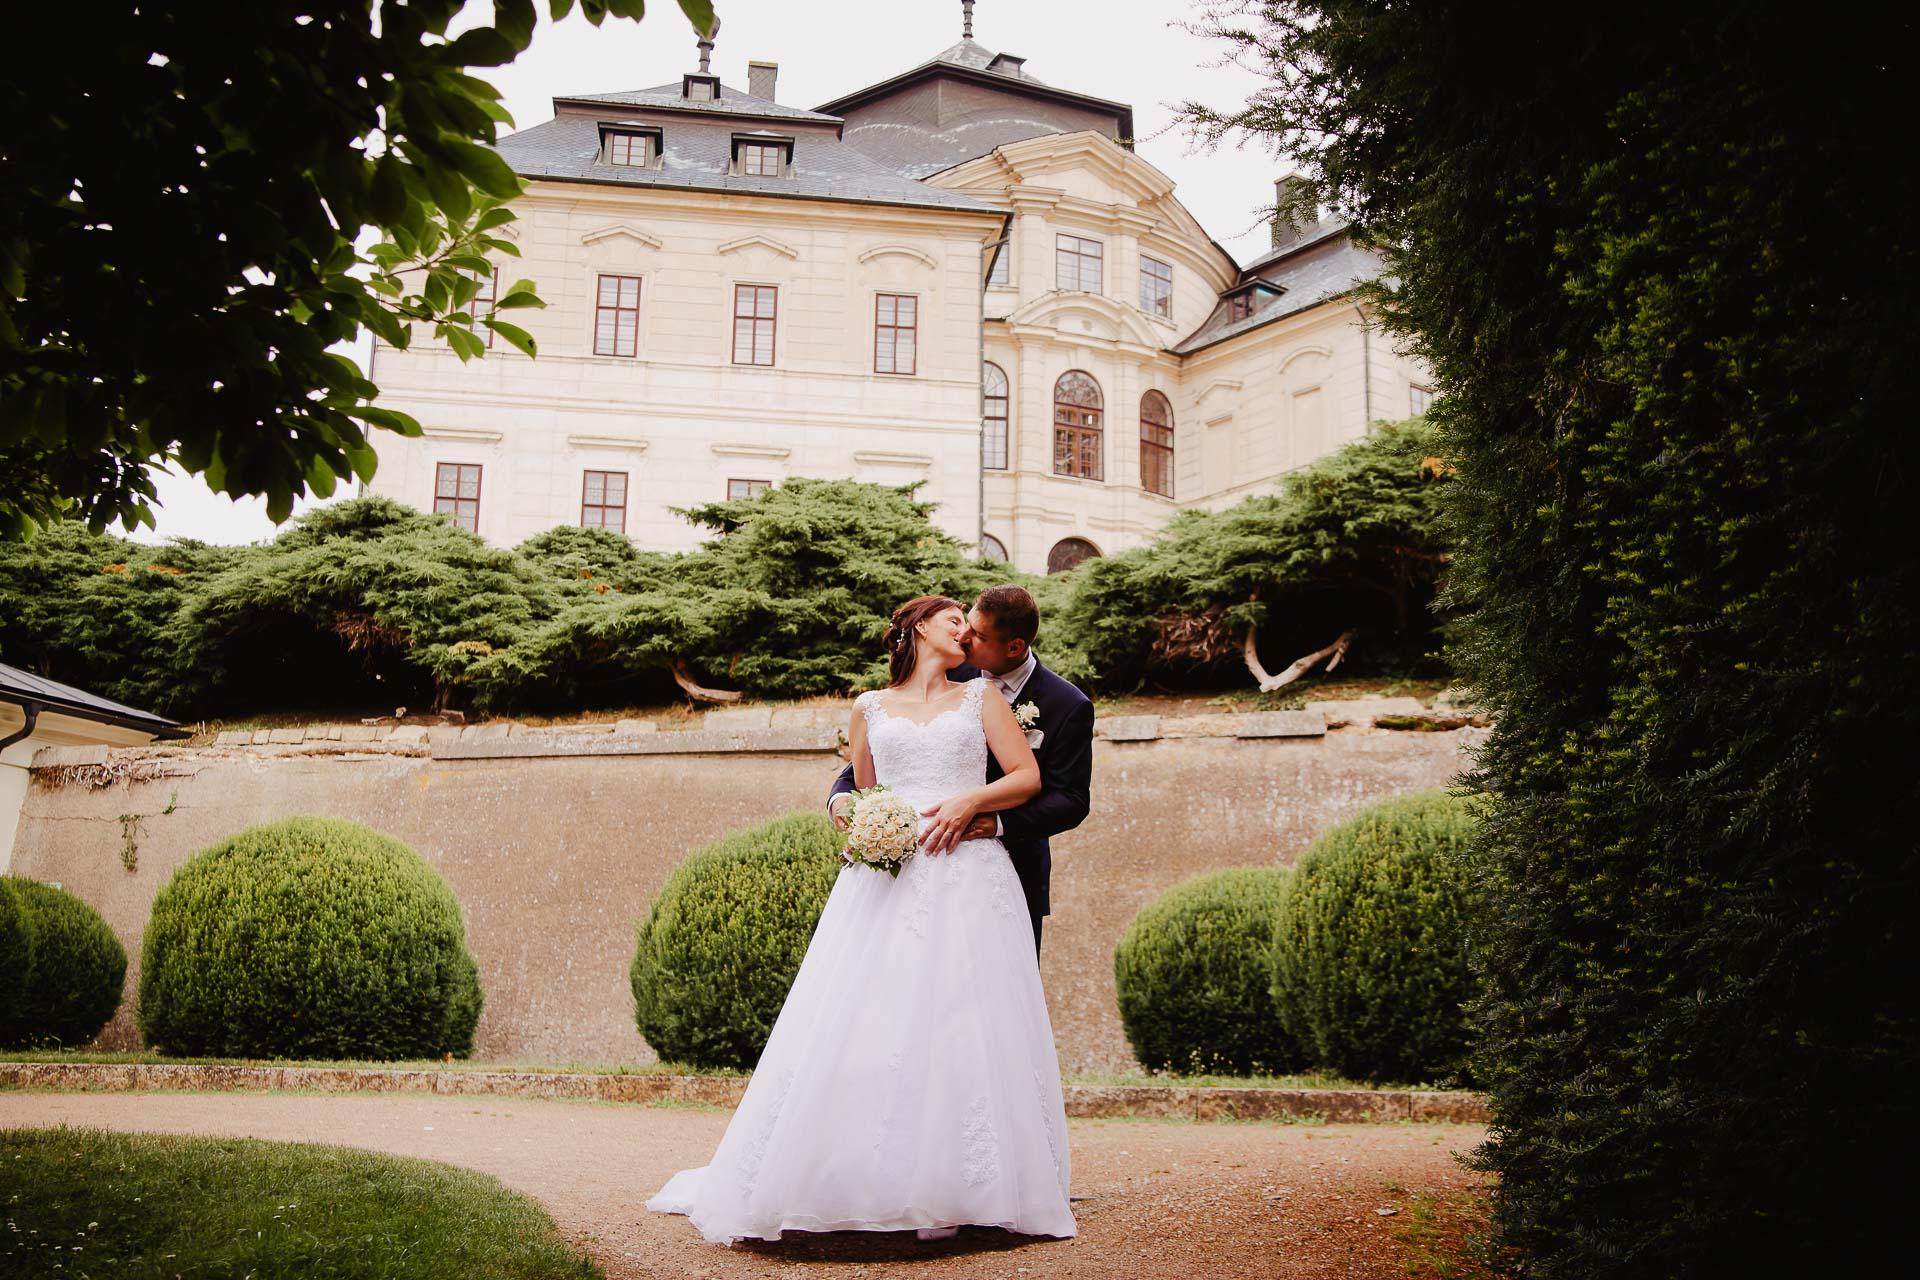 Svatební-fotograf-zámek-Karlova-Koruna-Chlumec-nad-Cidlinou-151